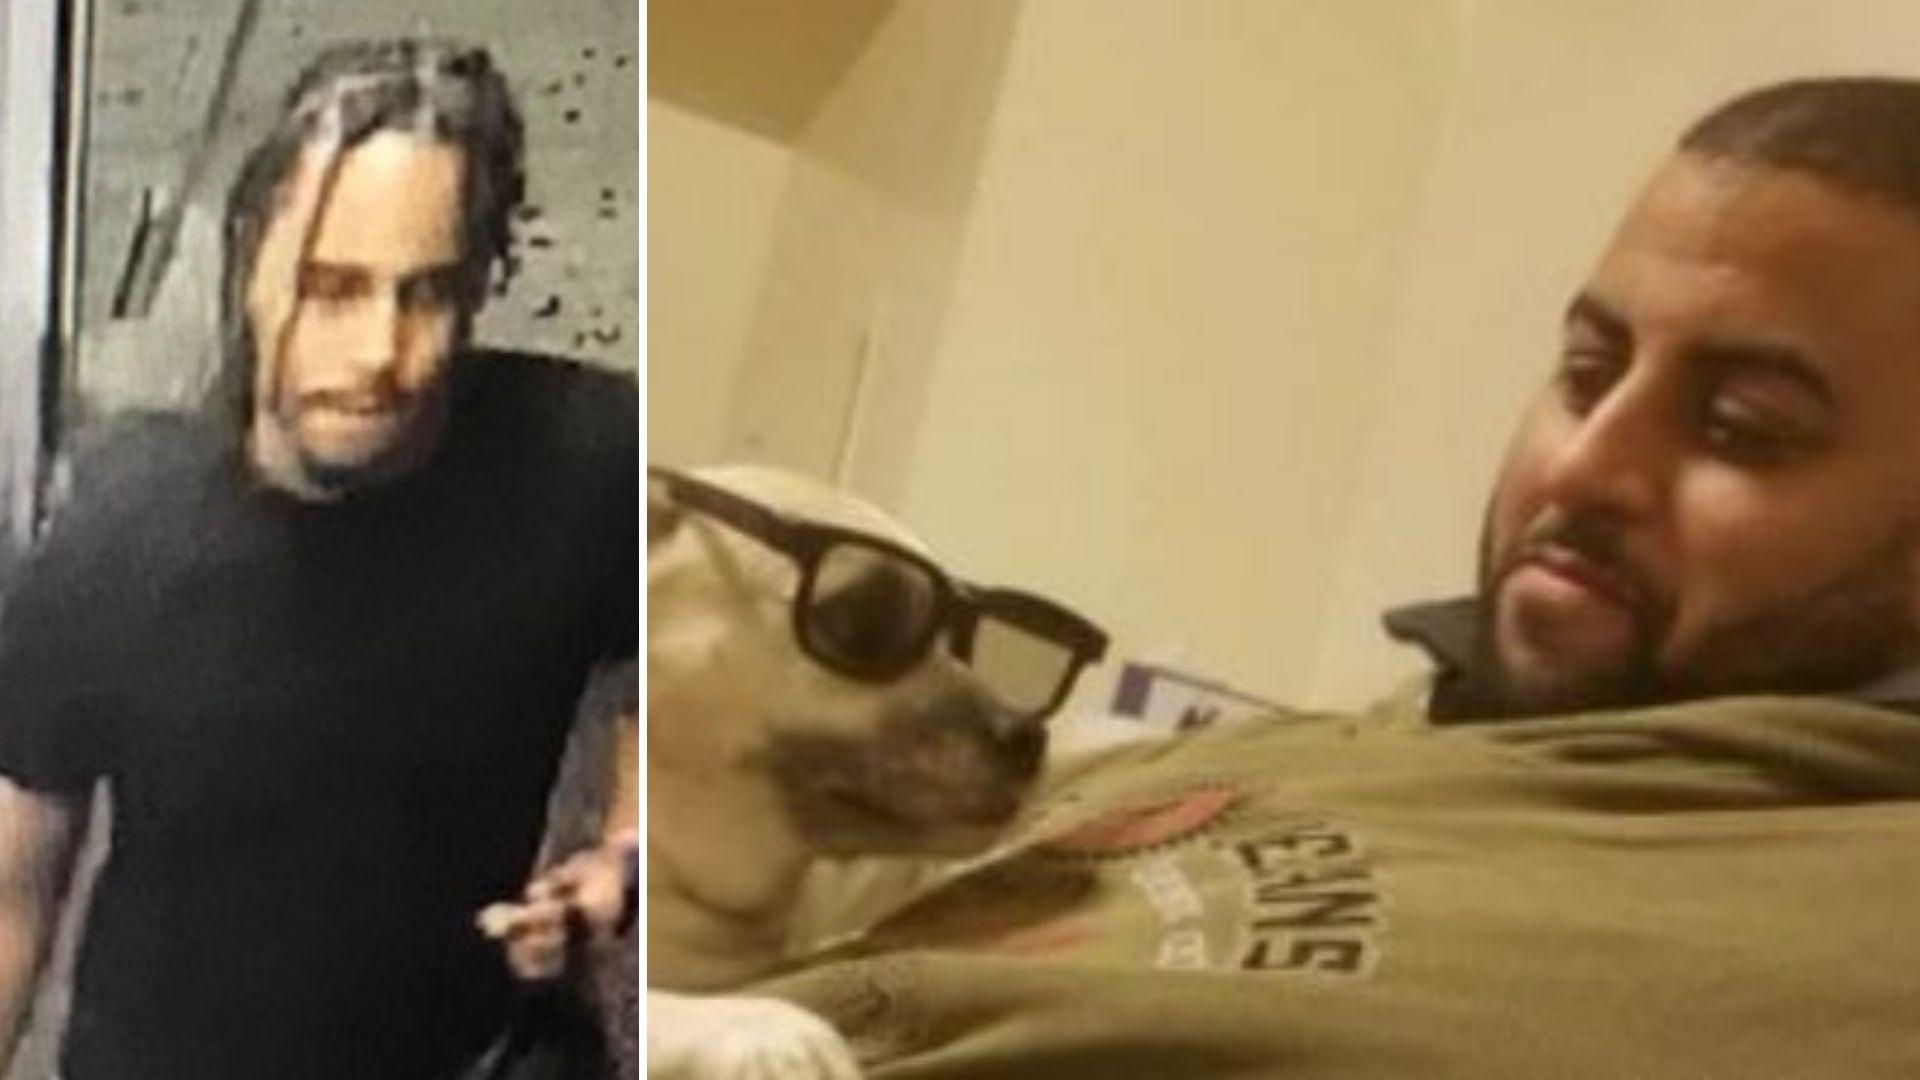 Police identify alleged gunman wanted for fatally shooting man walking his dog inHarlem